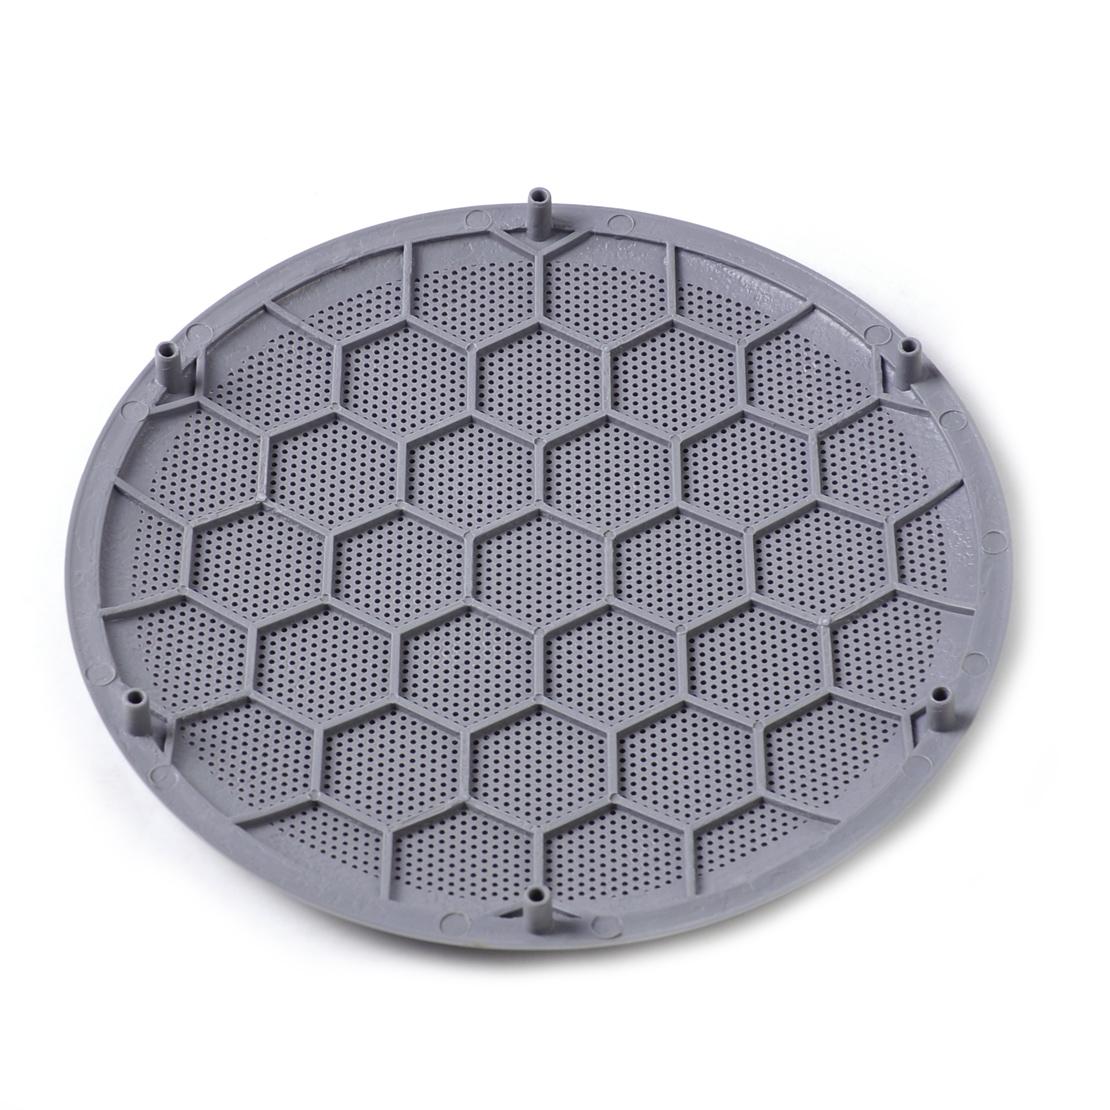 door speaker cover grill 3b0868149 fit for vw passat b5 jetta mk4 golf gti 2005 ebay. Black Bedroom Furniture Sets. Home Design Ideas